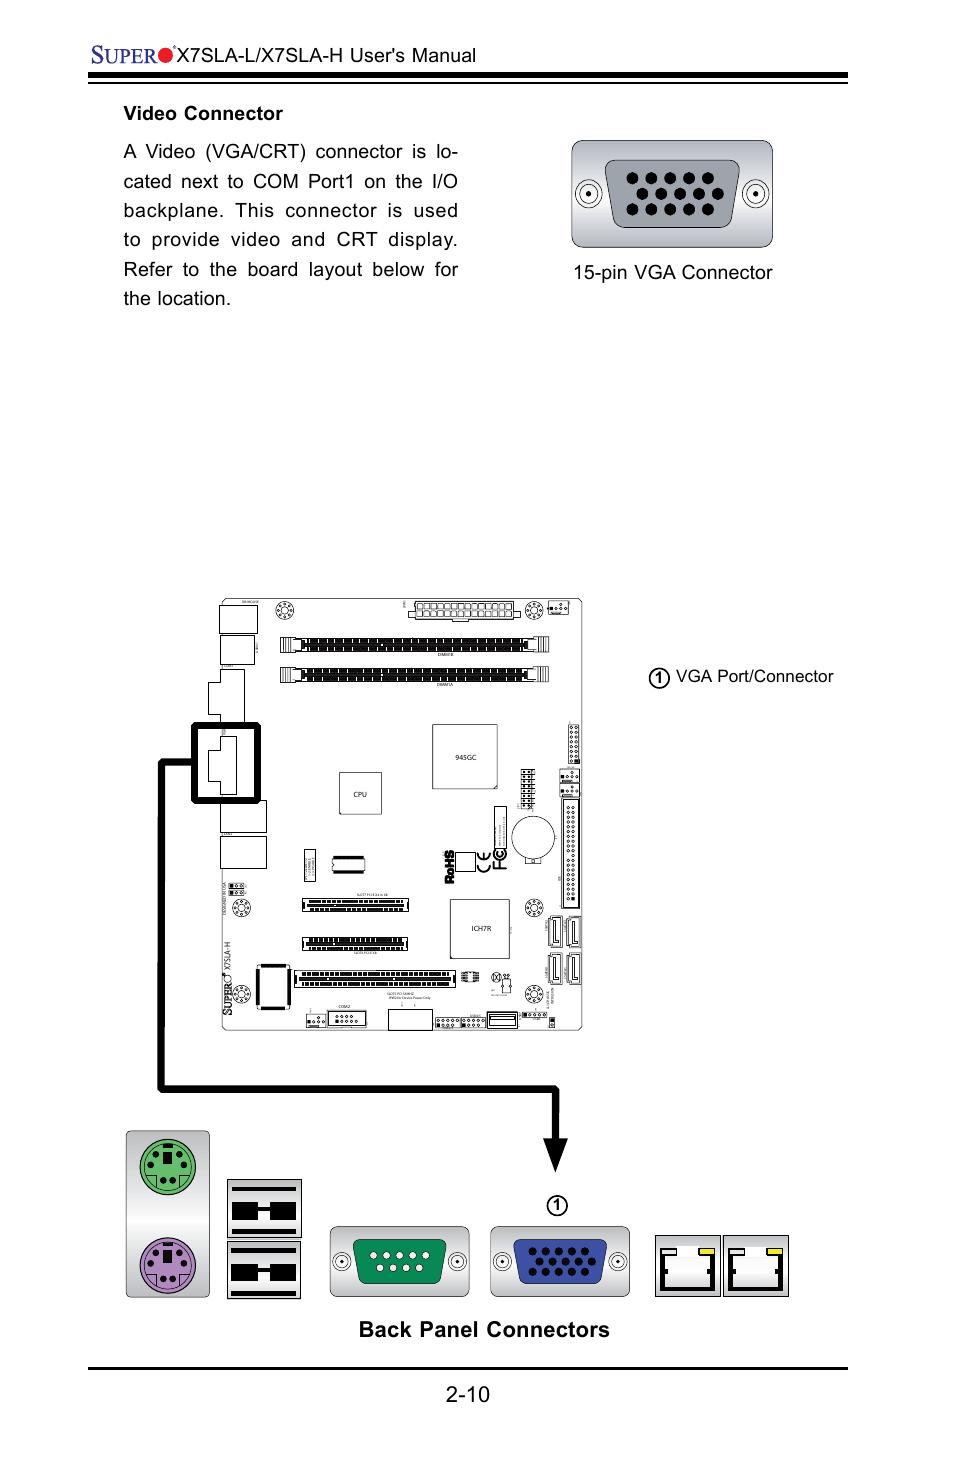 hight resolution of back panel connectors x7sla l x7sla h user s manual pin vga